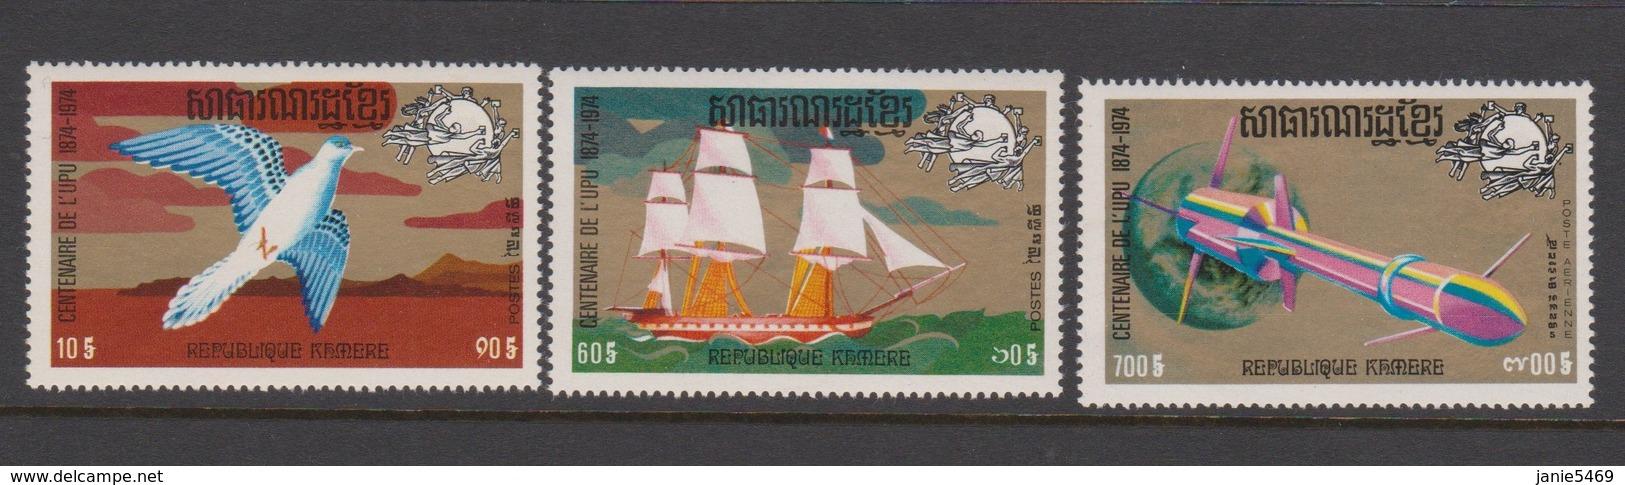 Cambodia Scott 331-332,C50 1974 Centenary Of UPU ,mint Never Hinged - Cambodia